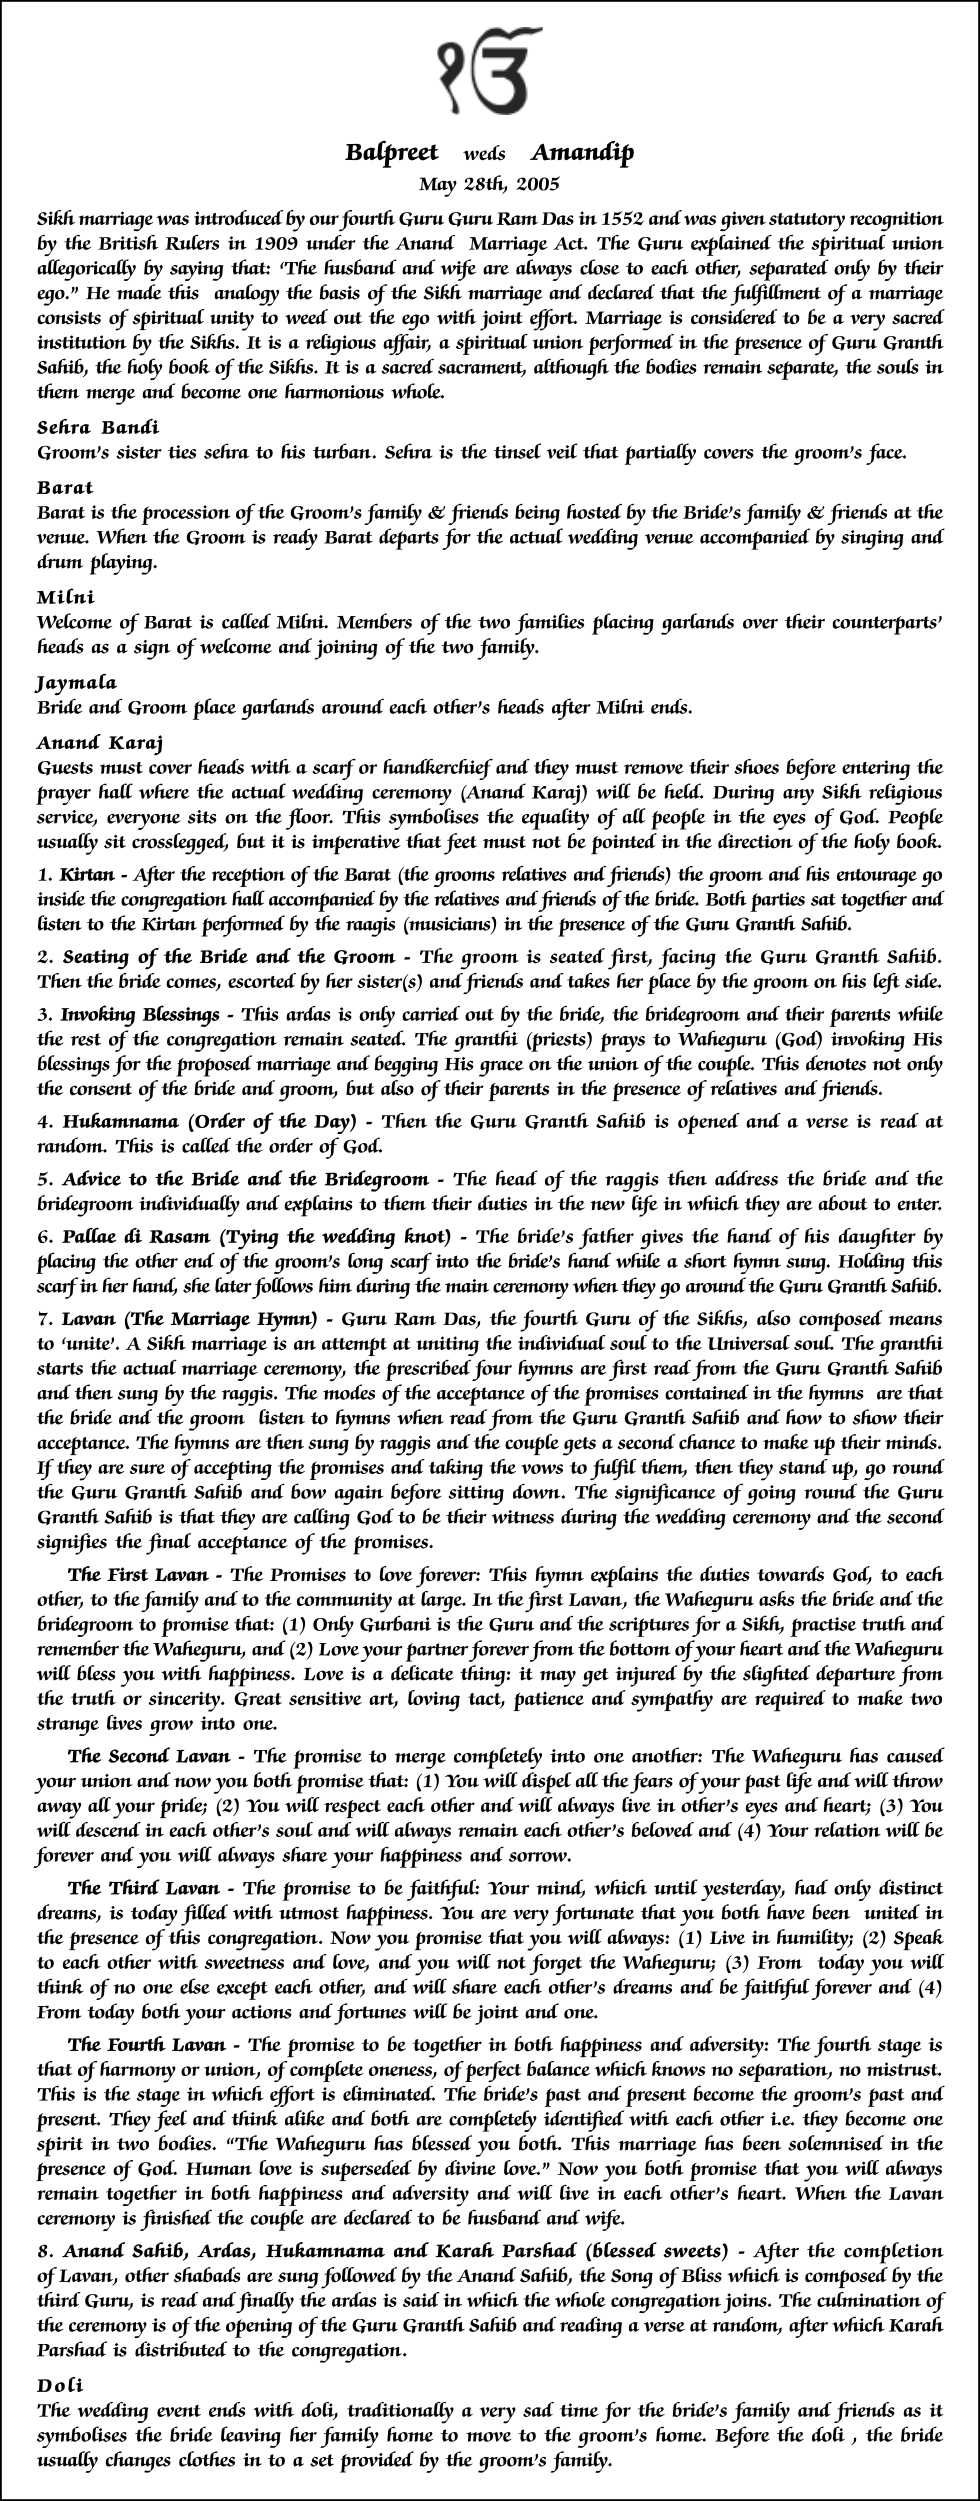 visual essay structure Essay on Wedding Ceremony